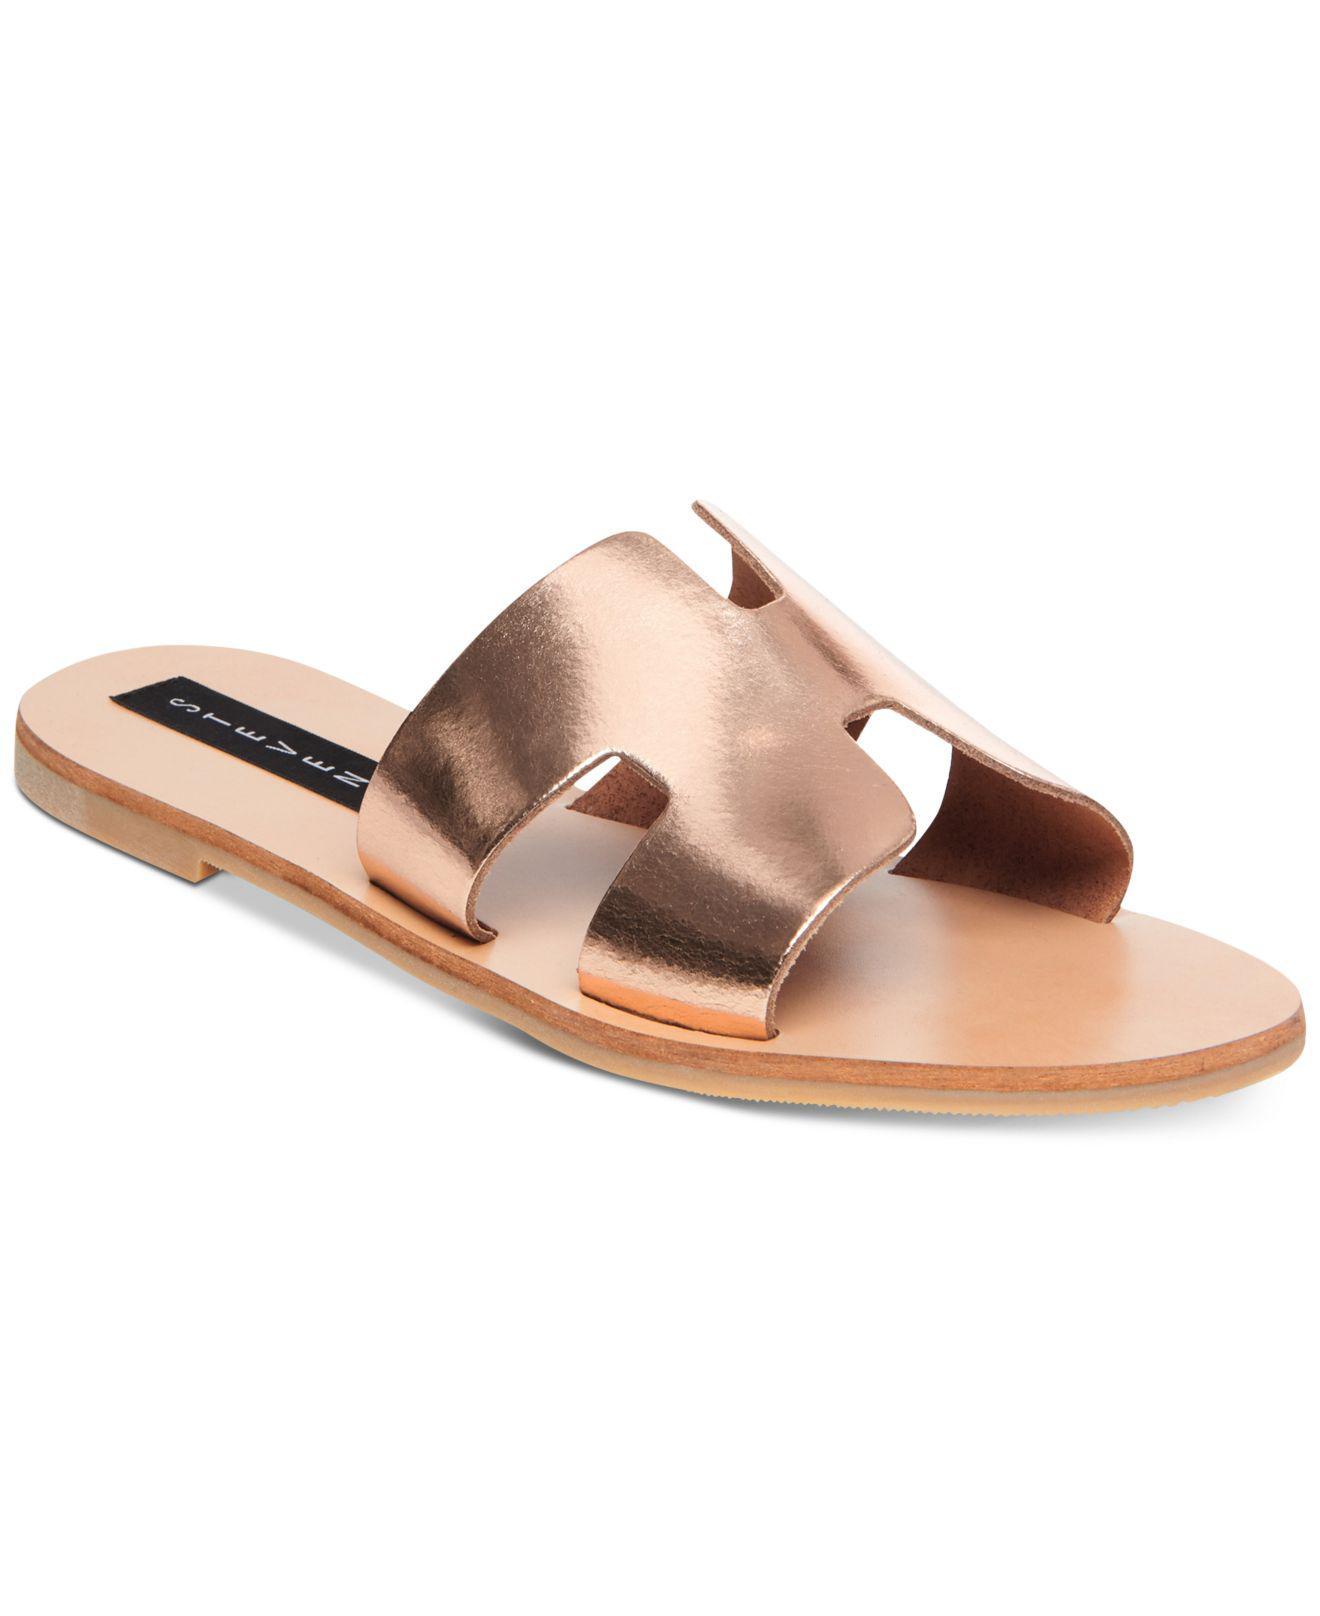 1e407648bc5 Lyst - Steven by Steve Madden Women s Greece Sandals